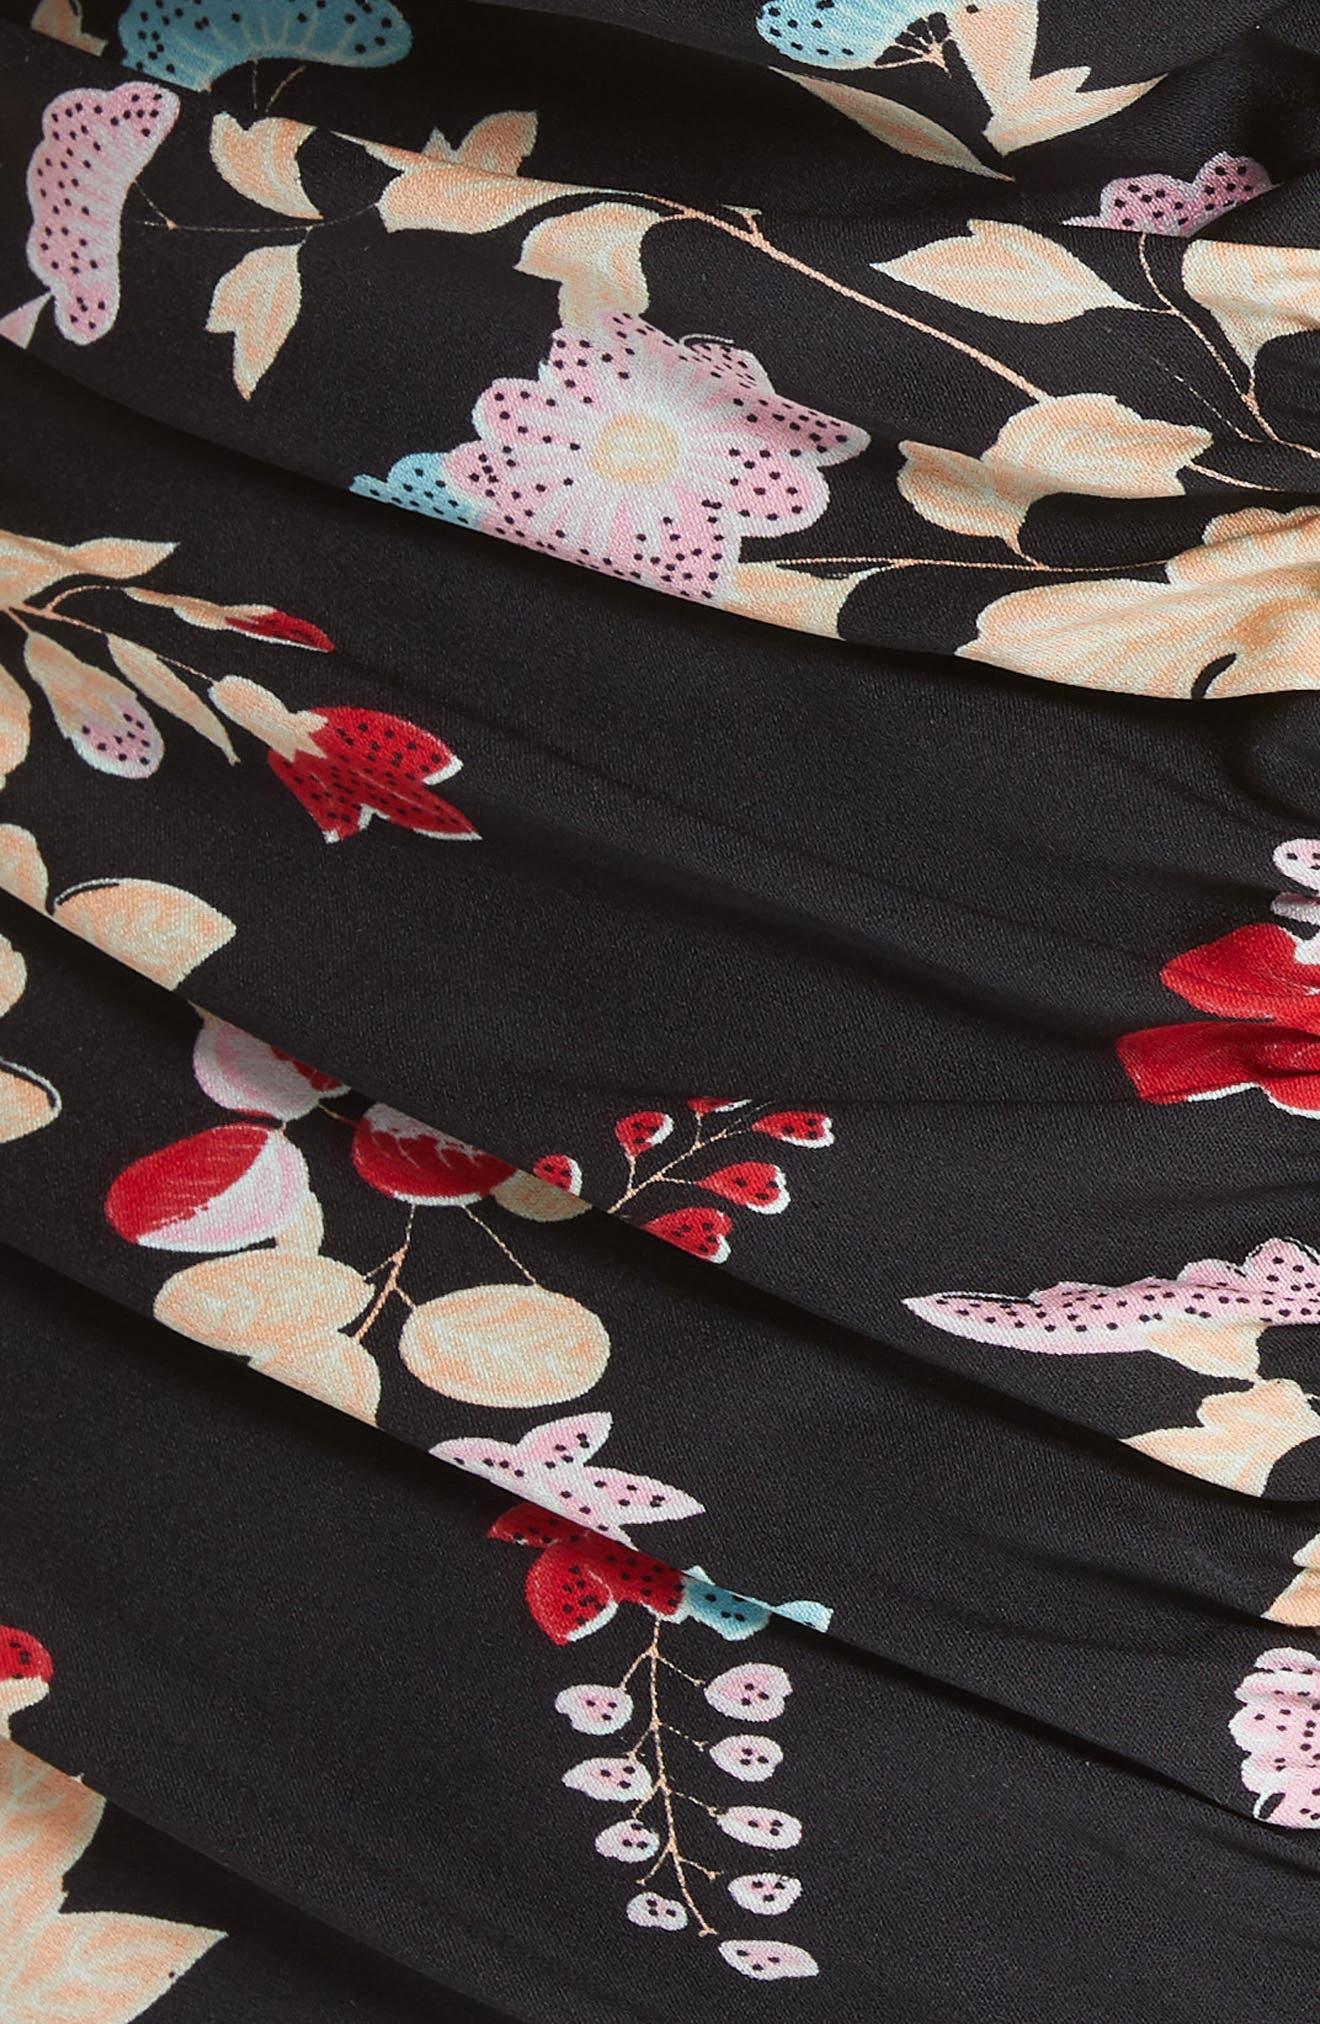 Diane von Furstenberg Sleeveless Ruched Floral Stretch Silk Bodysuit,                             Alternate thumbnail 5, color,                             004